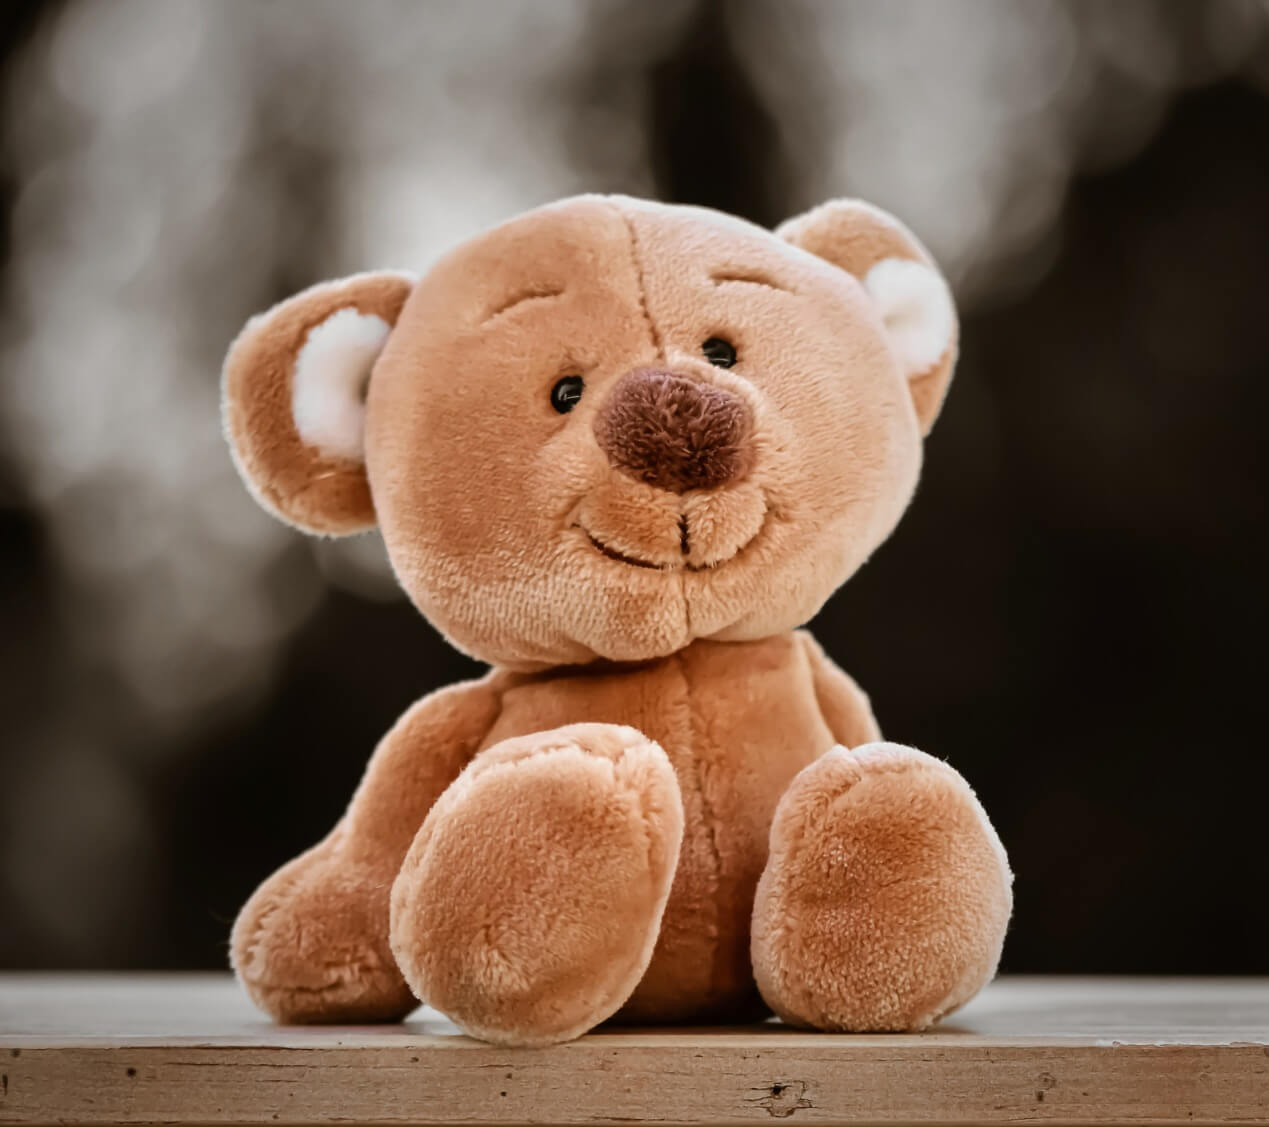 Teddy bear - Original image